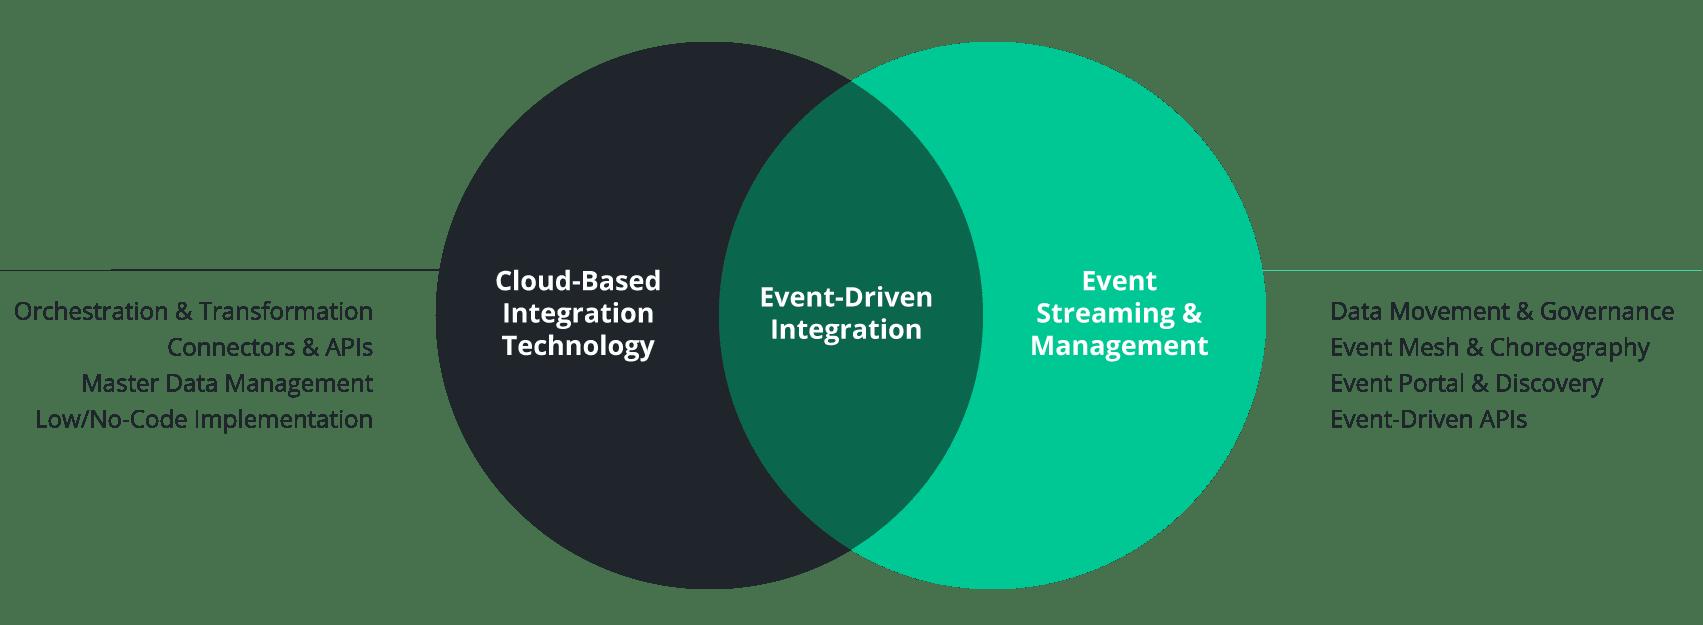 Event-driven integration is an enterprise architecture pattern